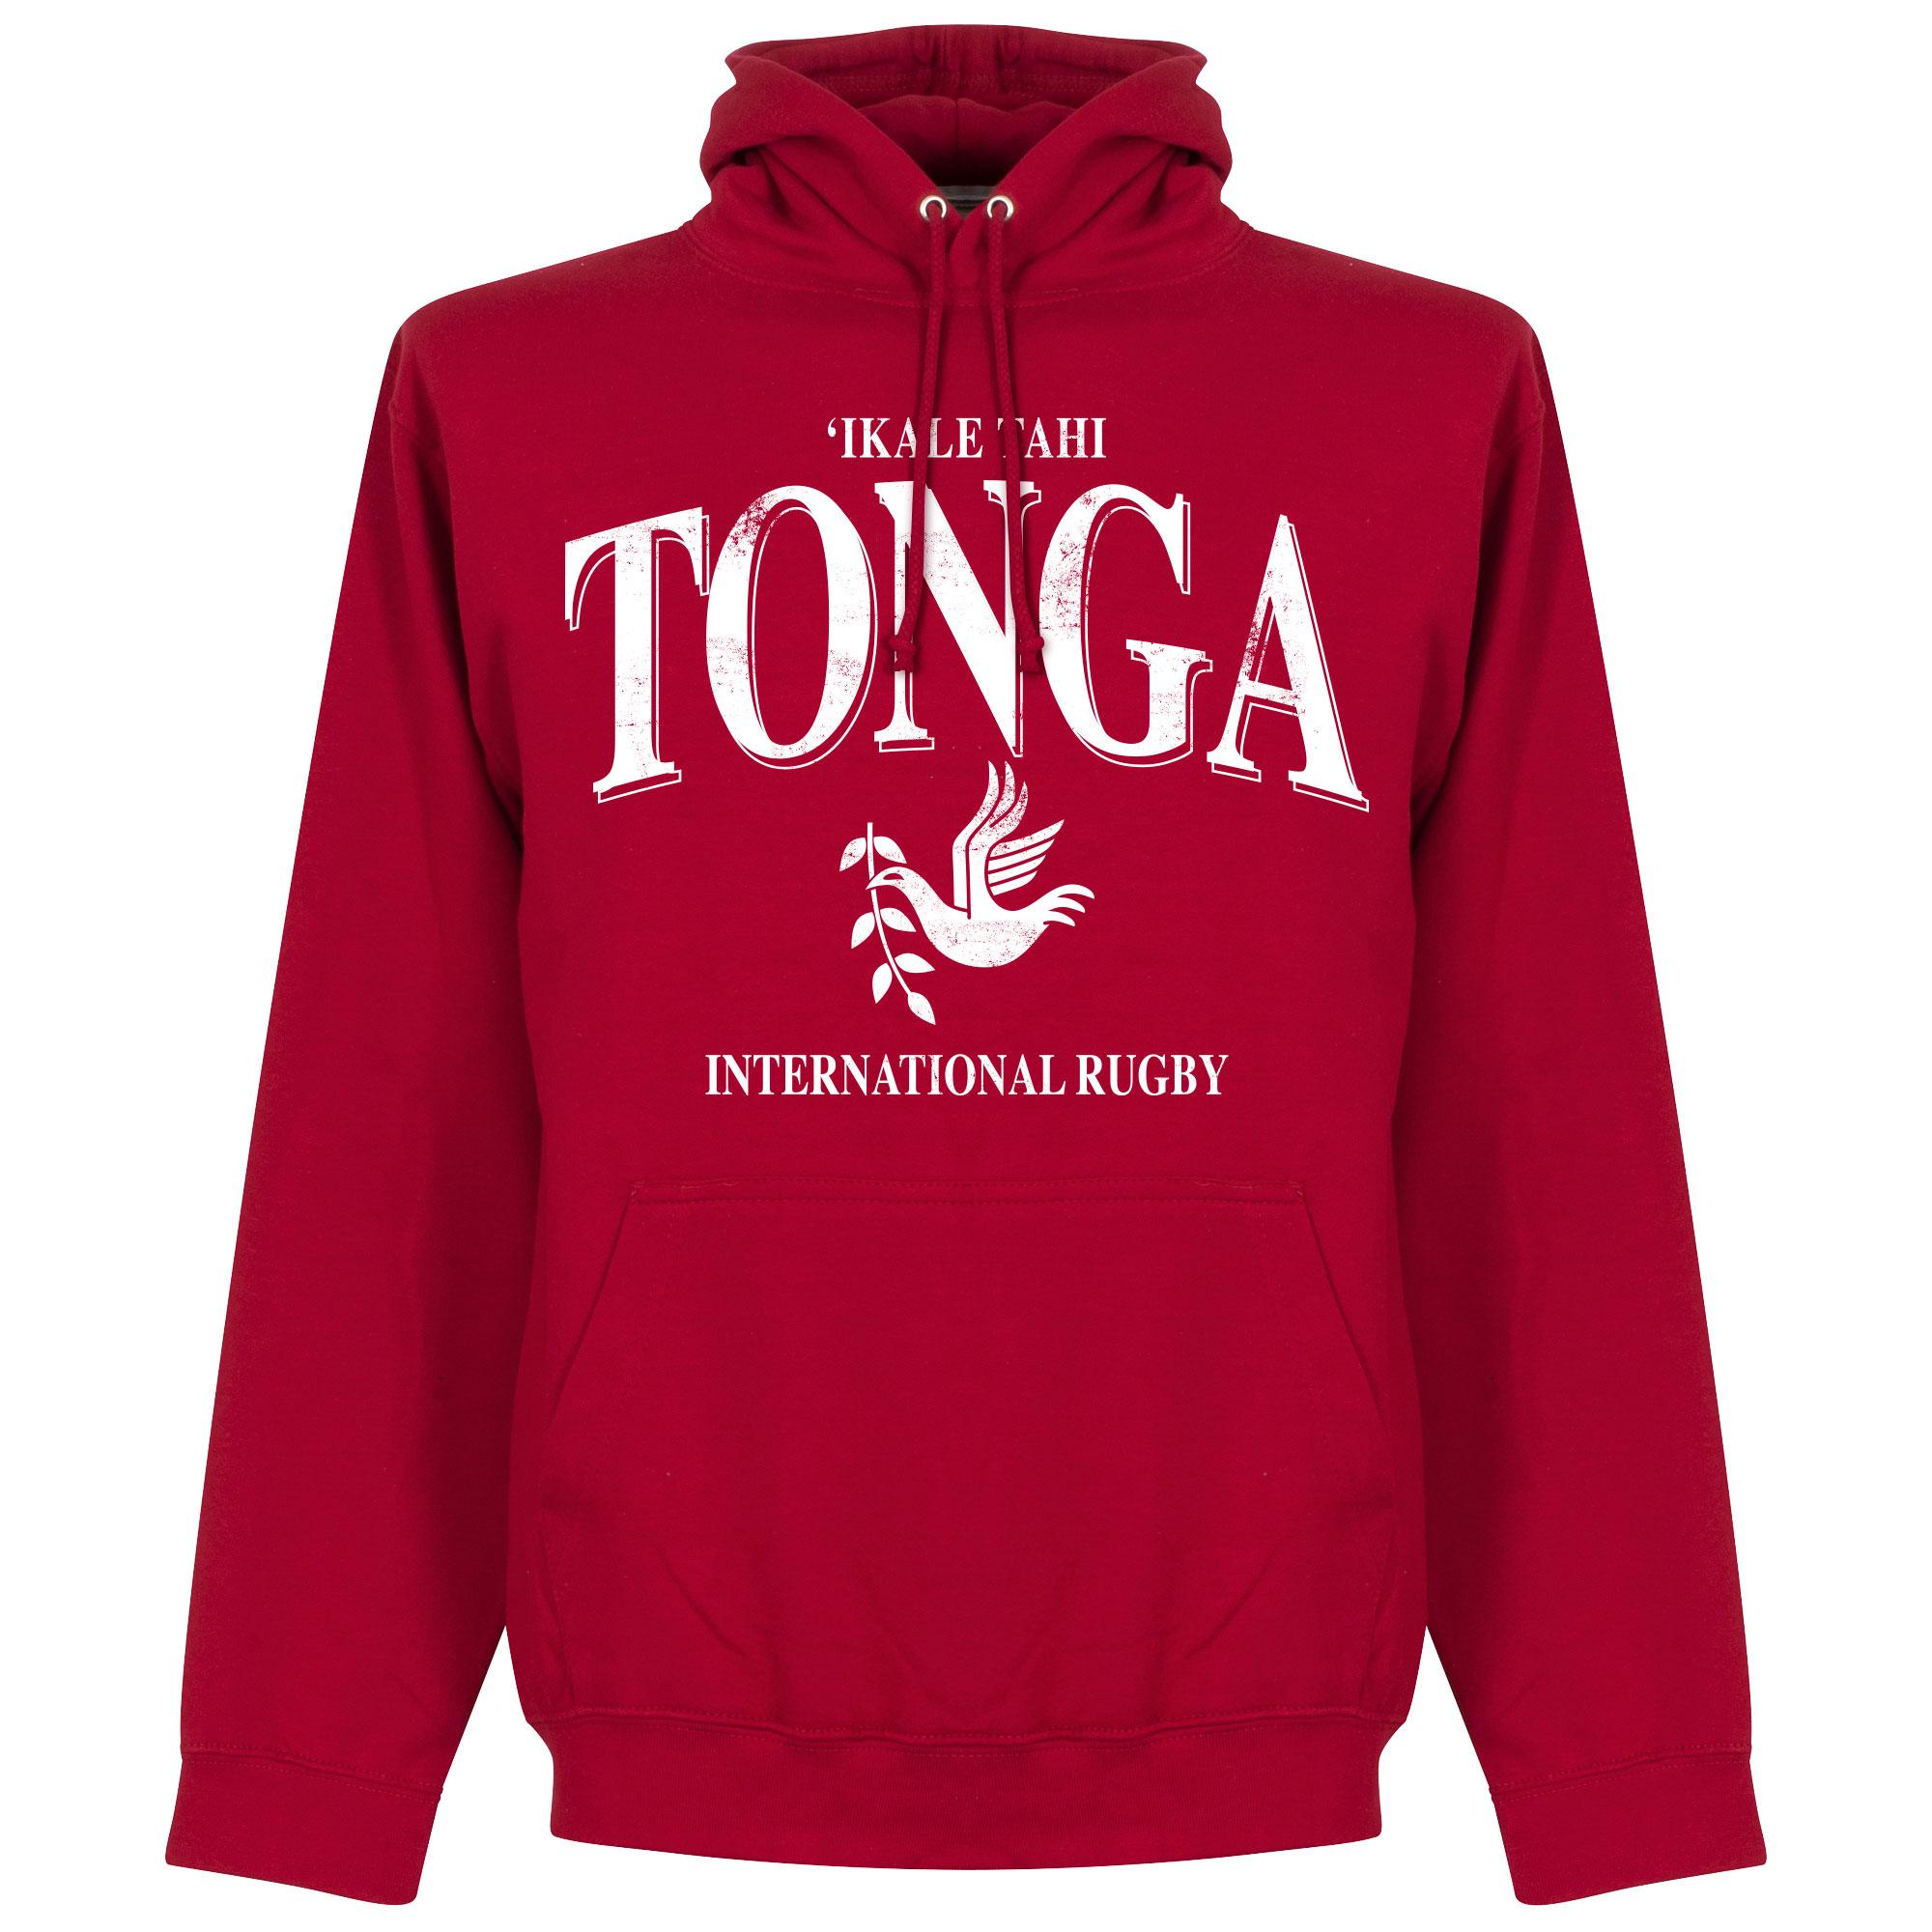 Tonga Rugby Hoodie - Rood